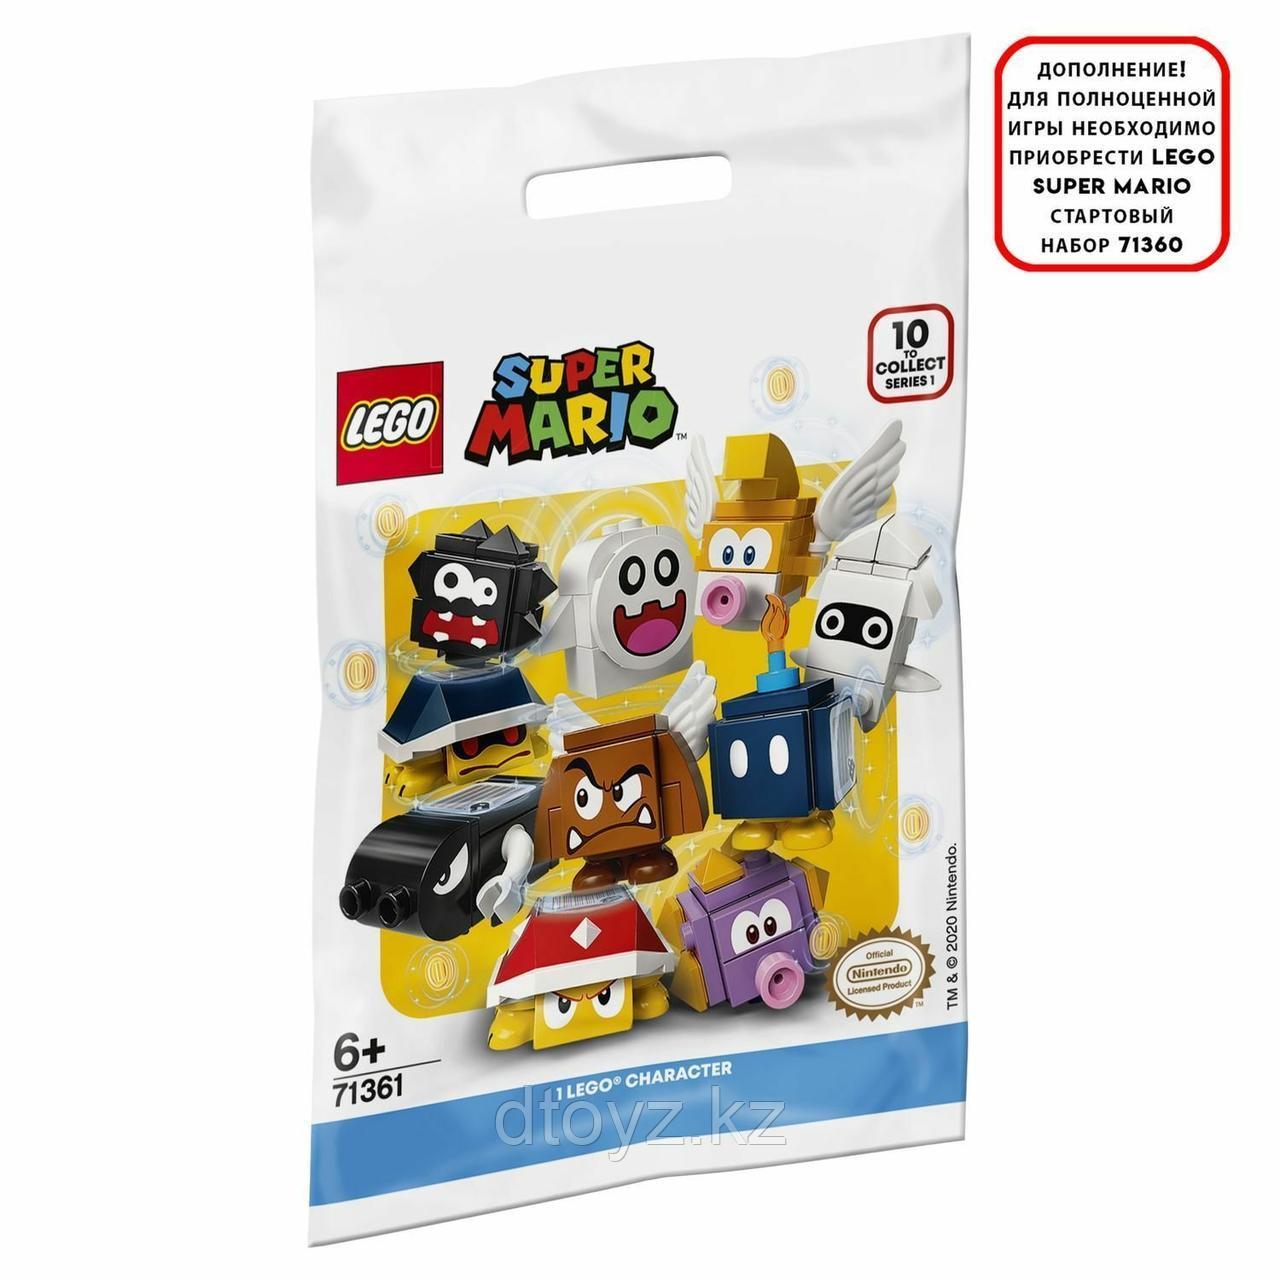 Lego Super Mario 71361 Фигурки персонажей